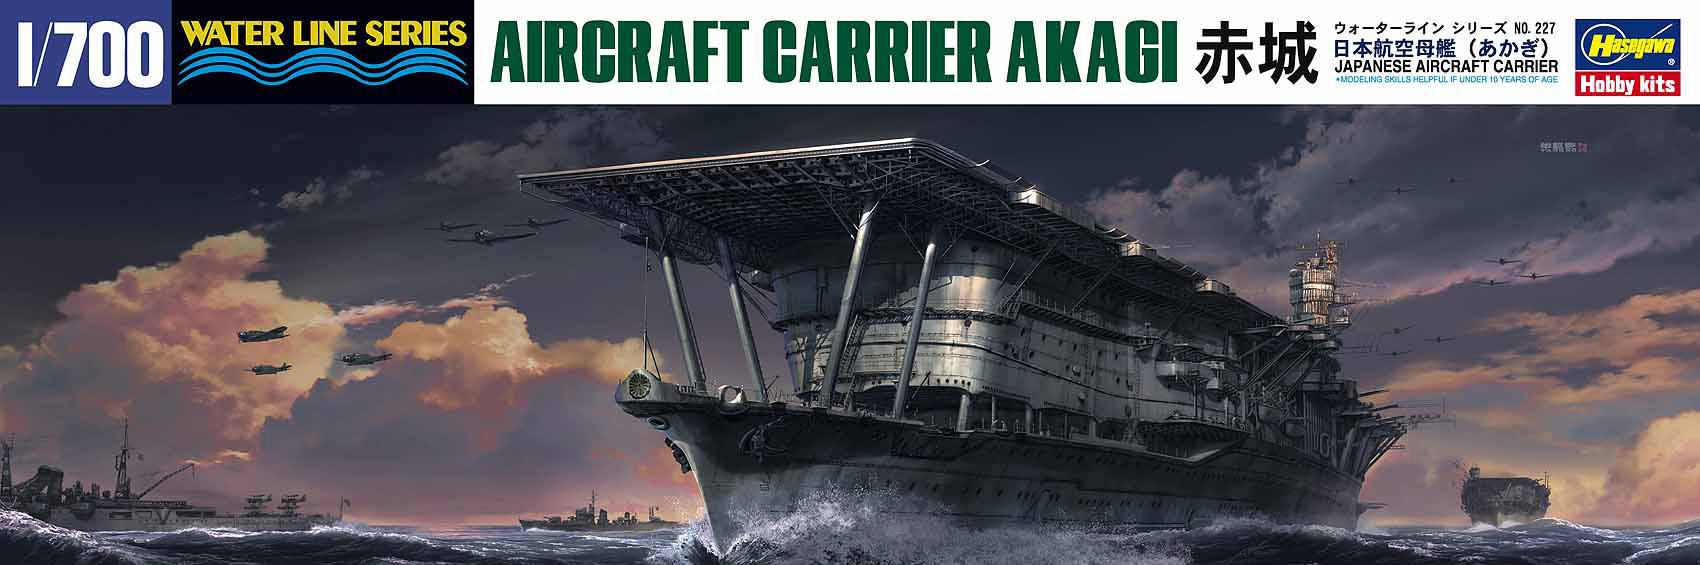 Hasegawa 1/700 Japanese Aircraft Carrier Akagi